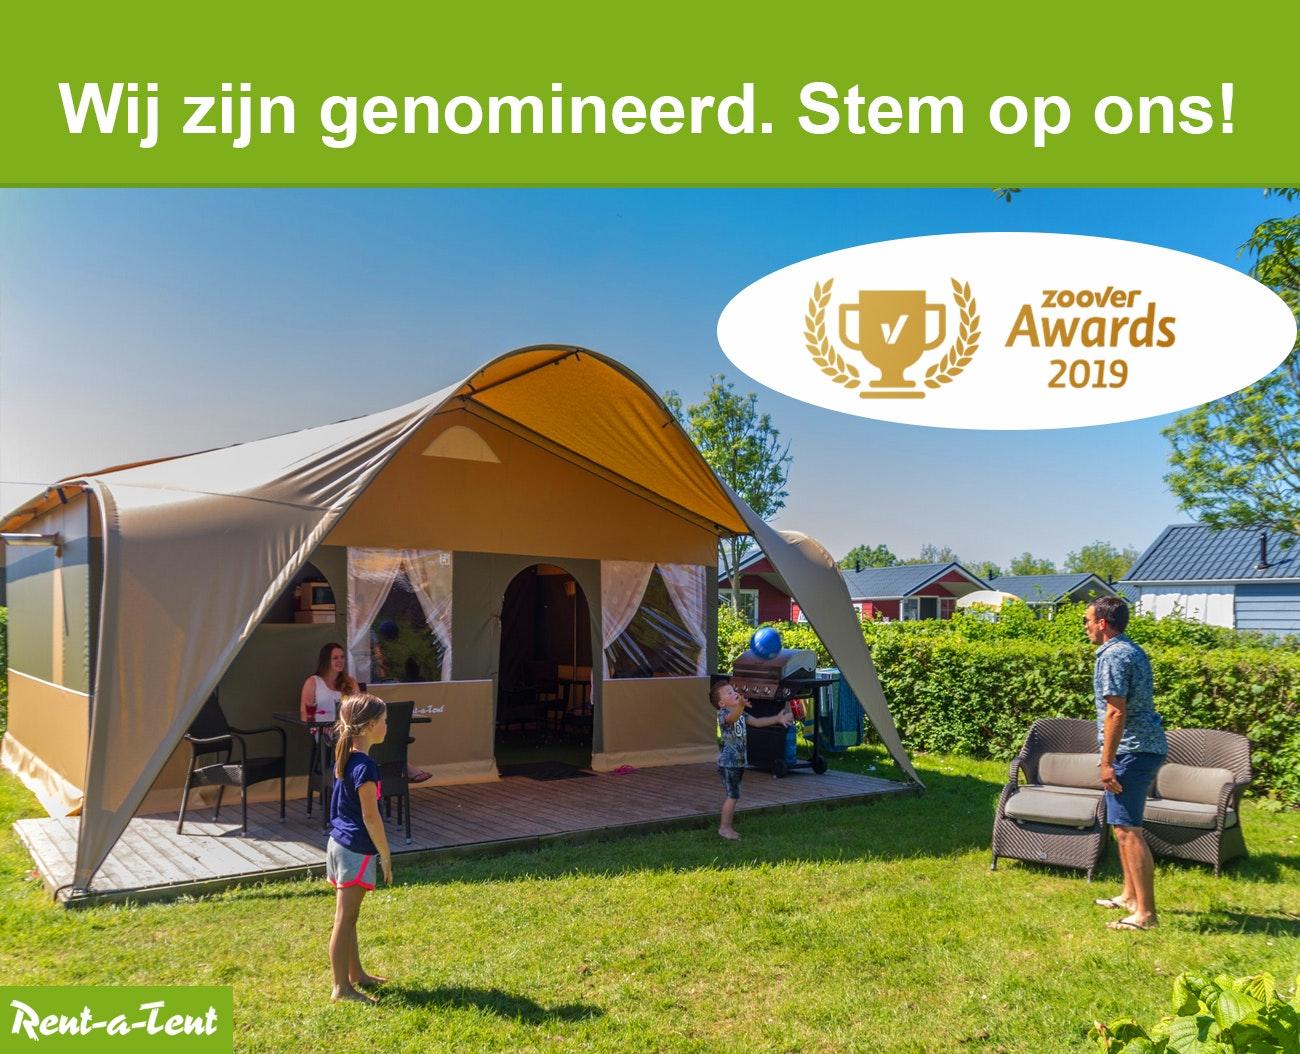 Stemmen Zoover Awards - De Pekelinge